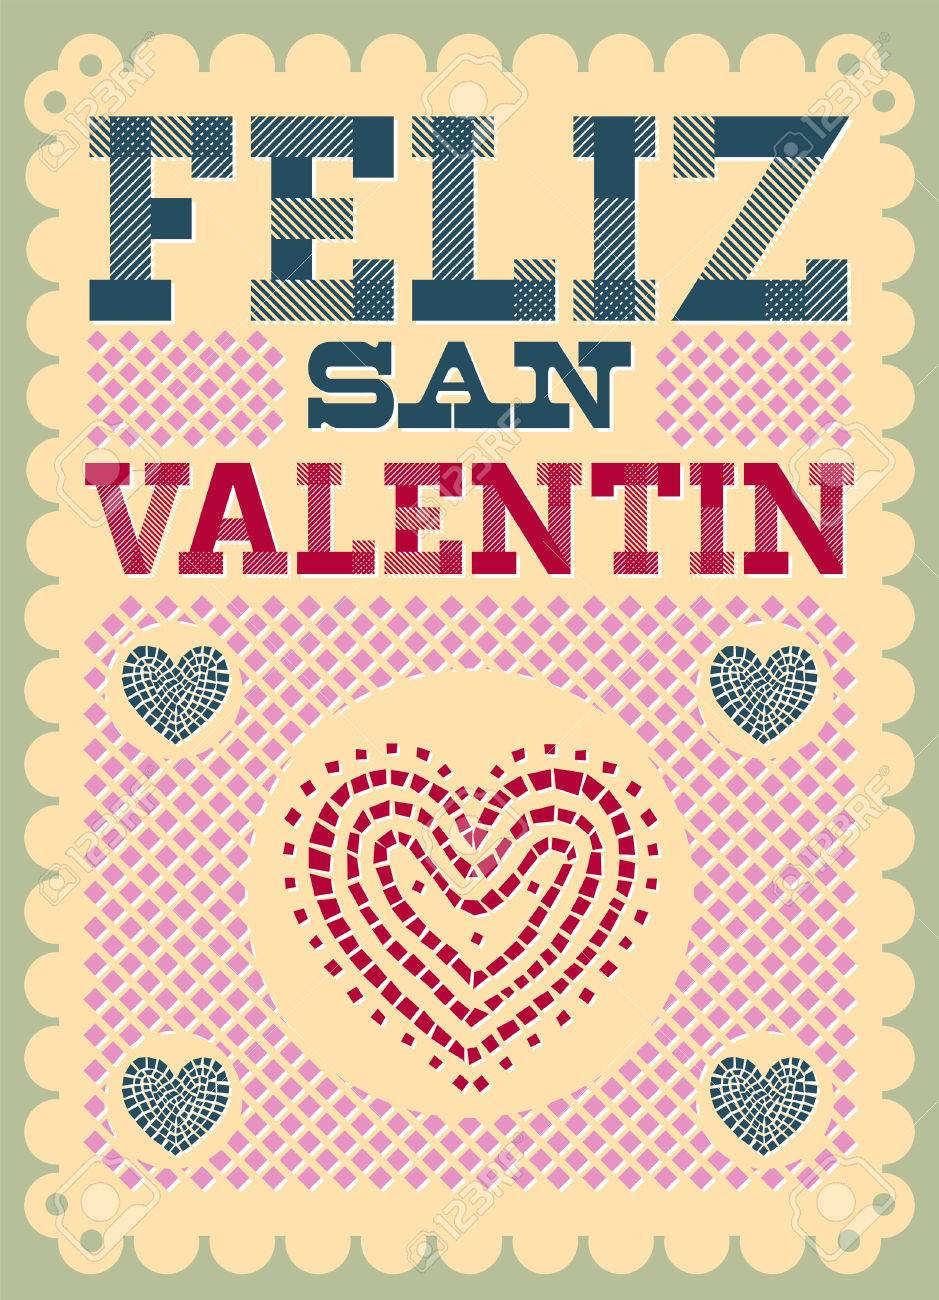 San Valentin Decoration Vintage Feliz San Valentin Happy Valentines Day Spanish Text